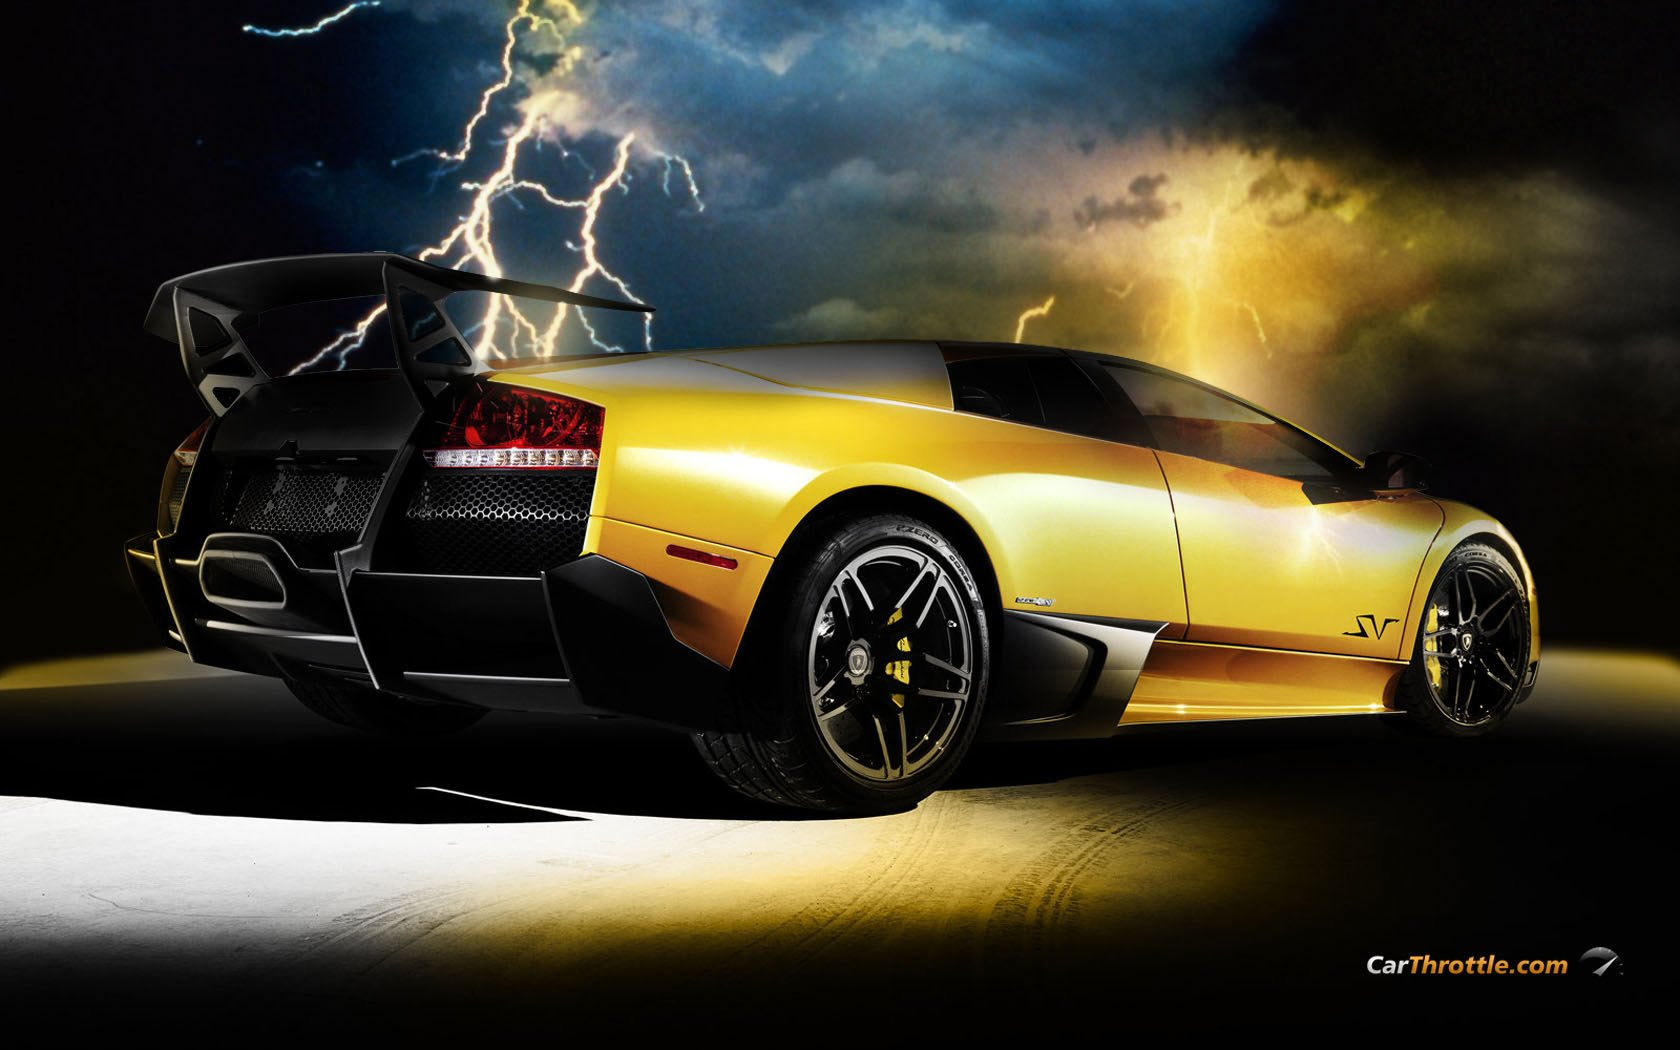 56 Lamborghini Murcielago Hd Wallpapers Background Images